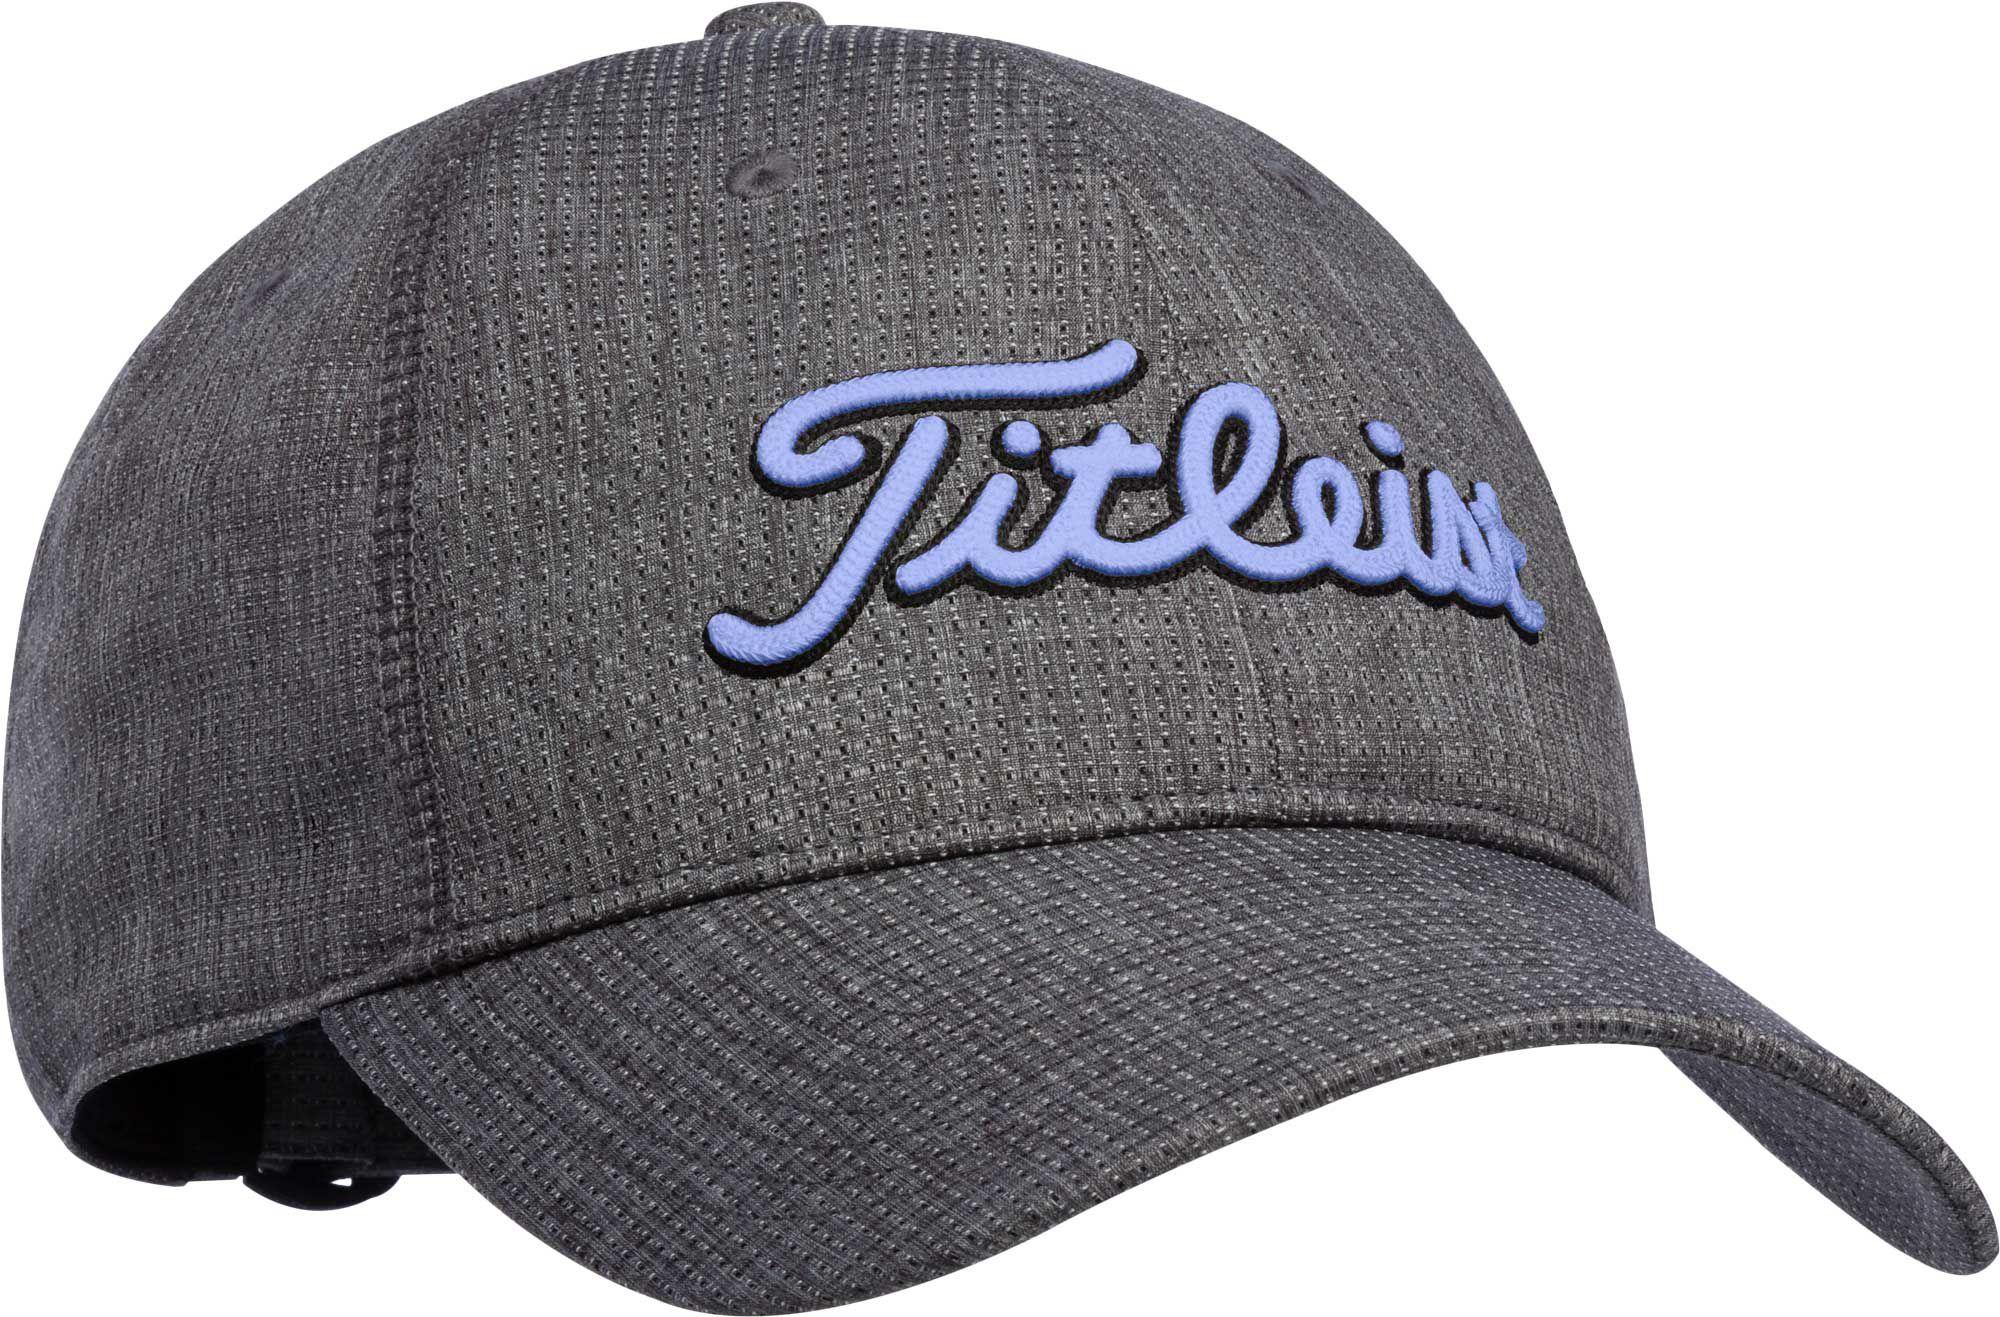 c41ea66ed3ad8 Titleist Women s Breezer Golf Hat